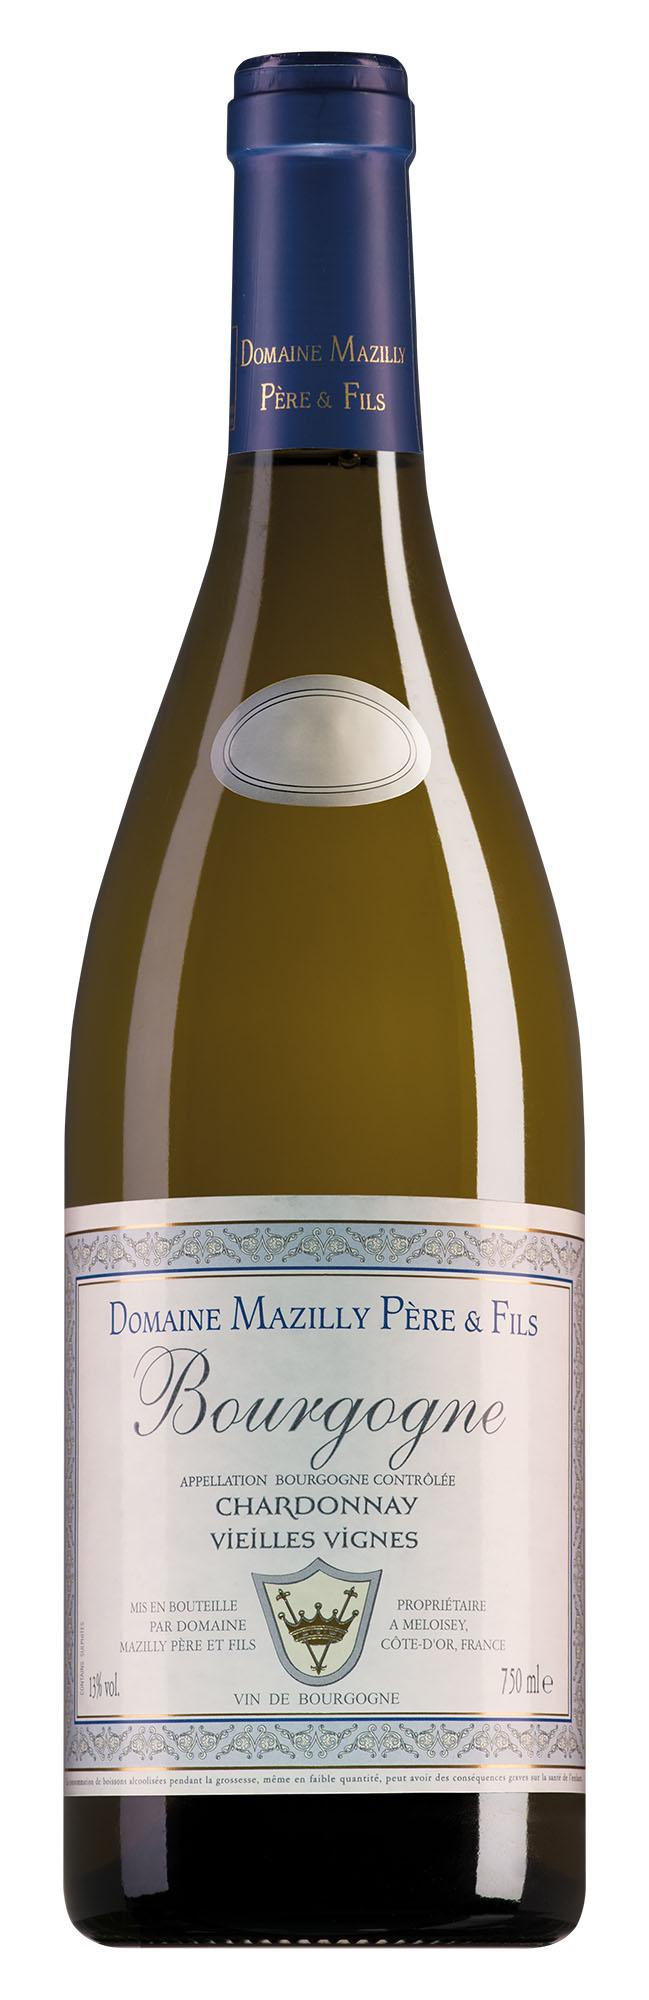 Domaine Mazilly Bourgogne Chardonnay Vieilles Vignes